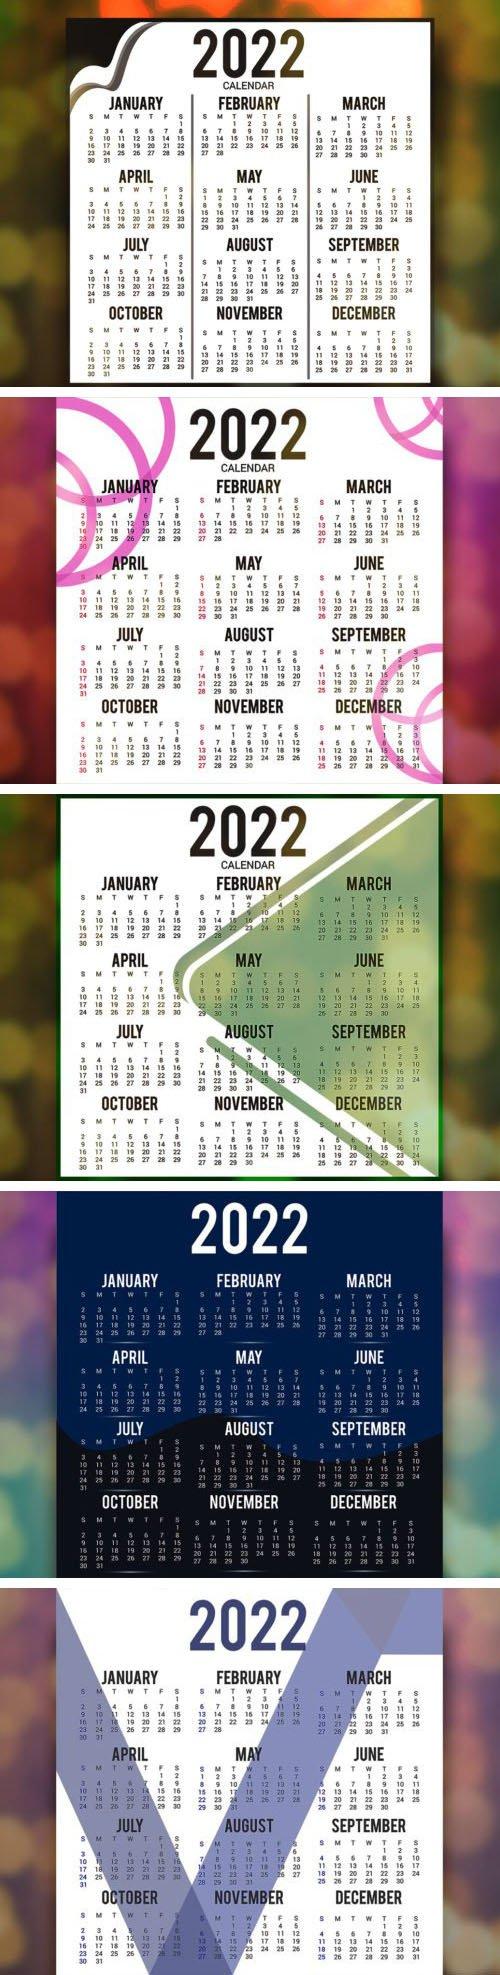 New Year Printable Calendar 2022 Templates